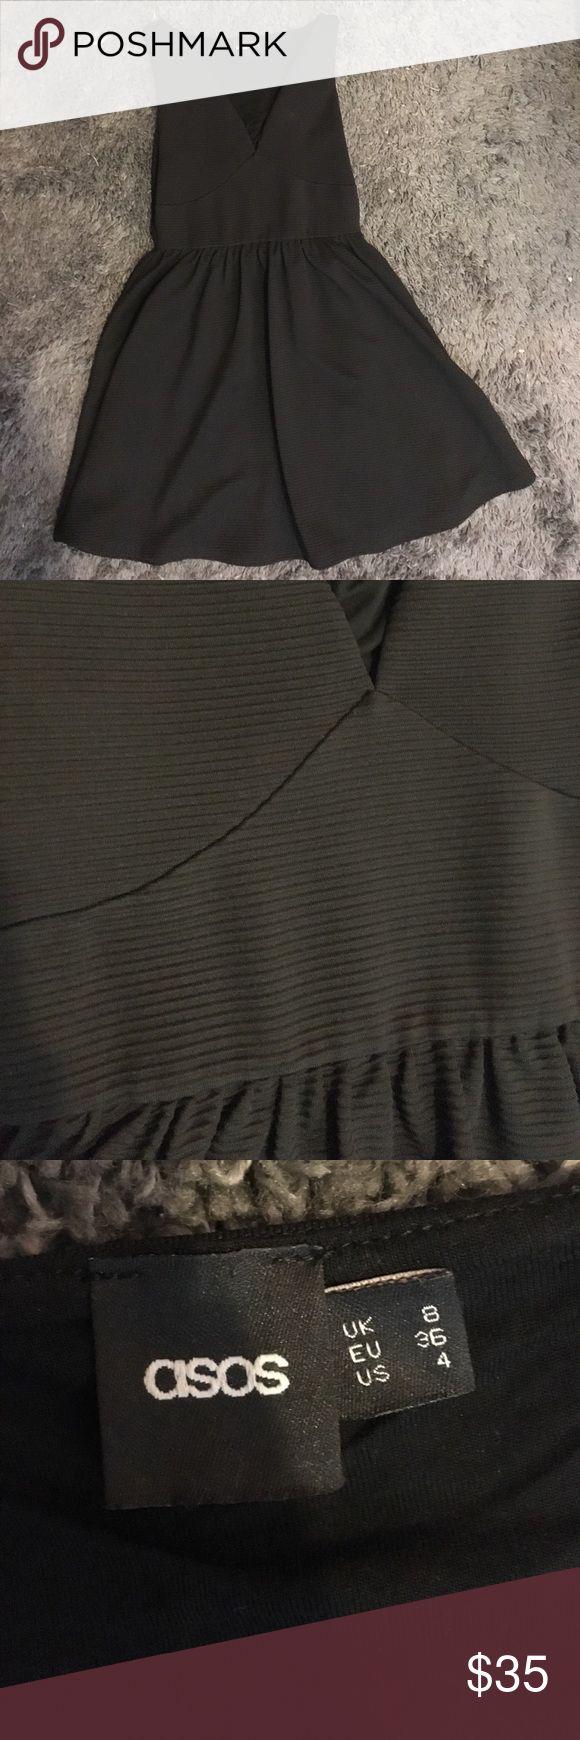 ASOS black dress! Textured stretchy black dress. So comfortable! ASOS Dresses Asymmetrical